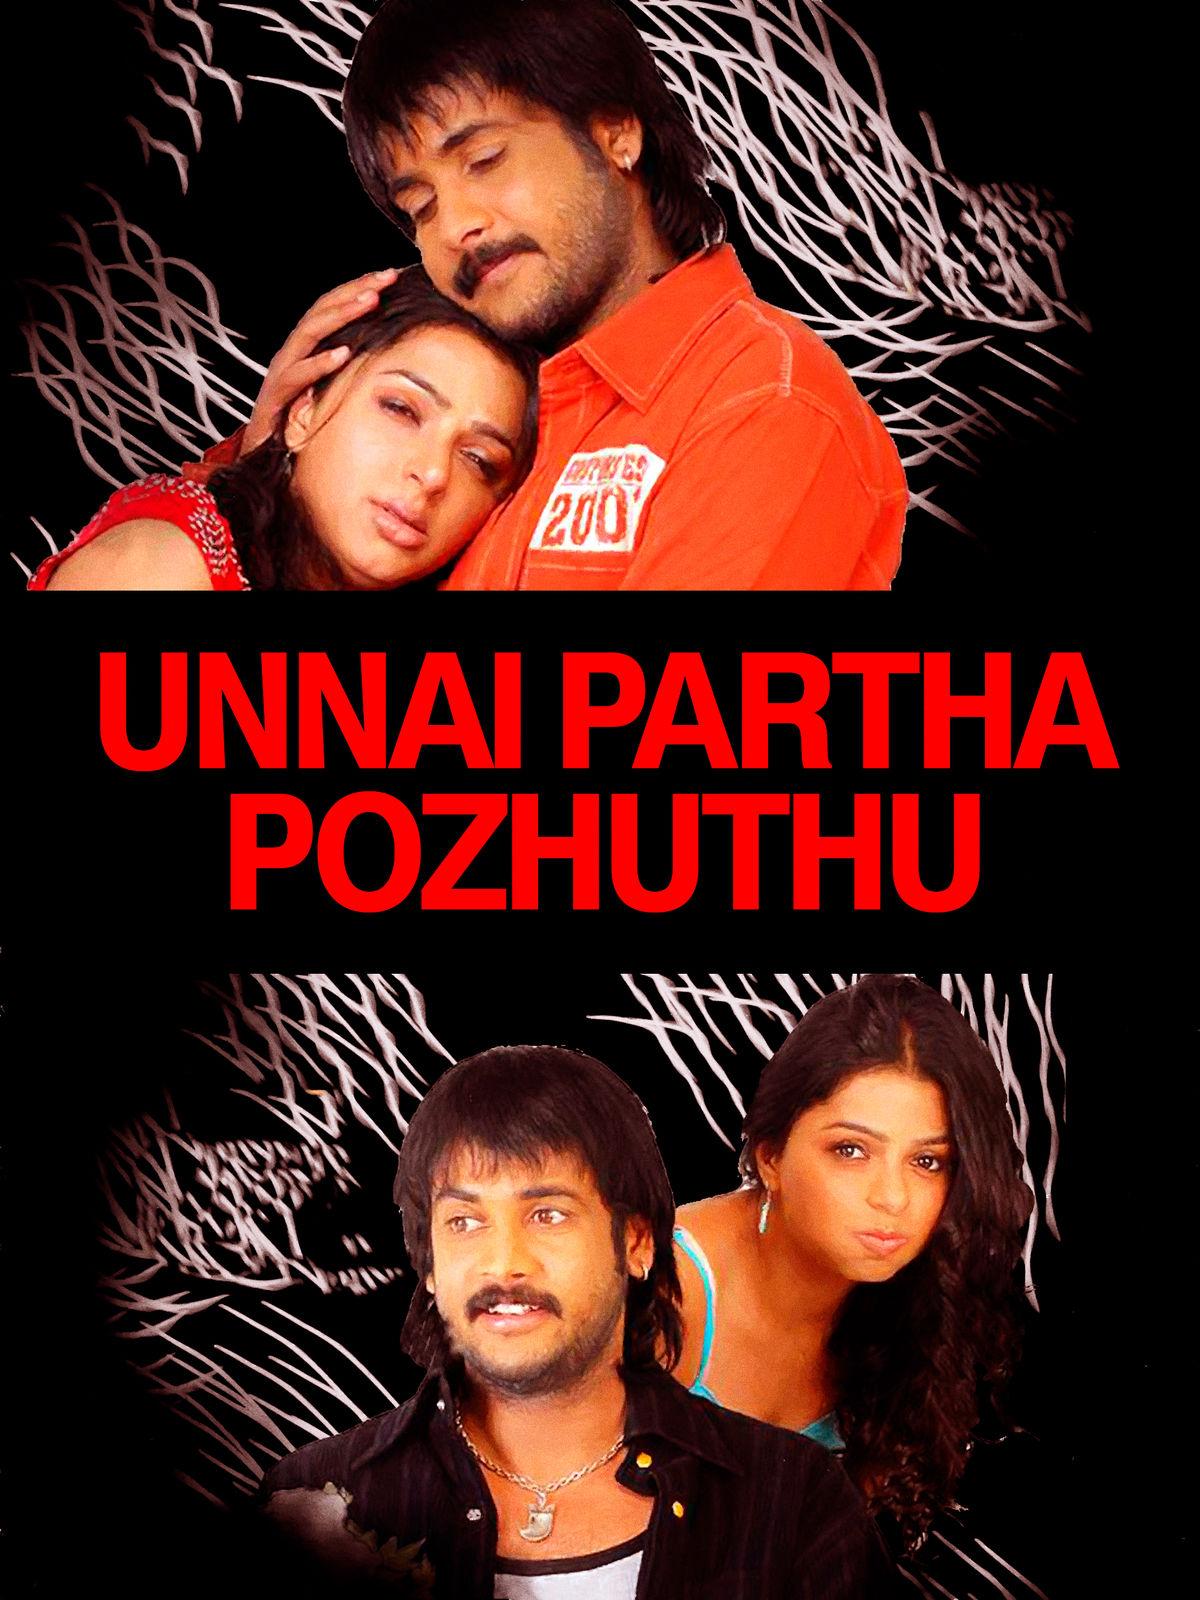 Unnai Partha Pozhuthu